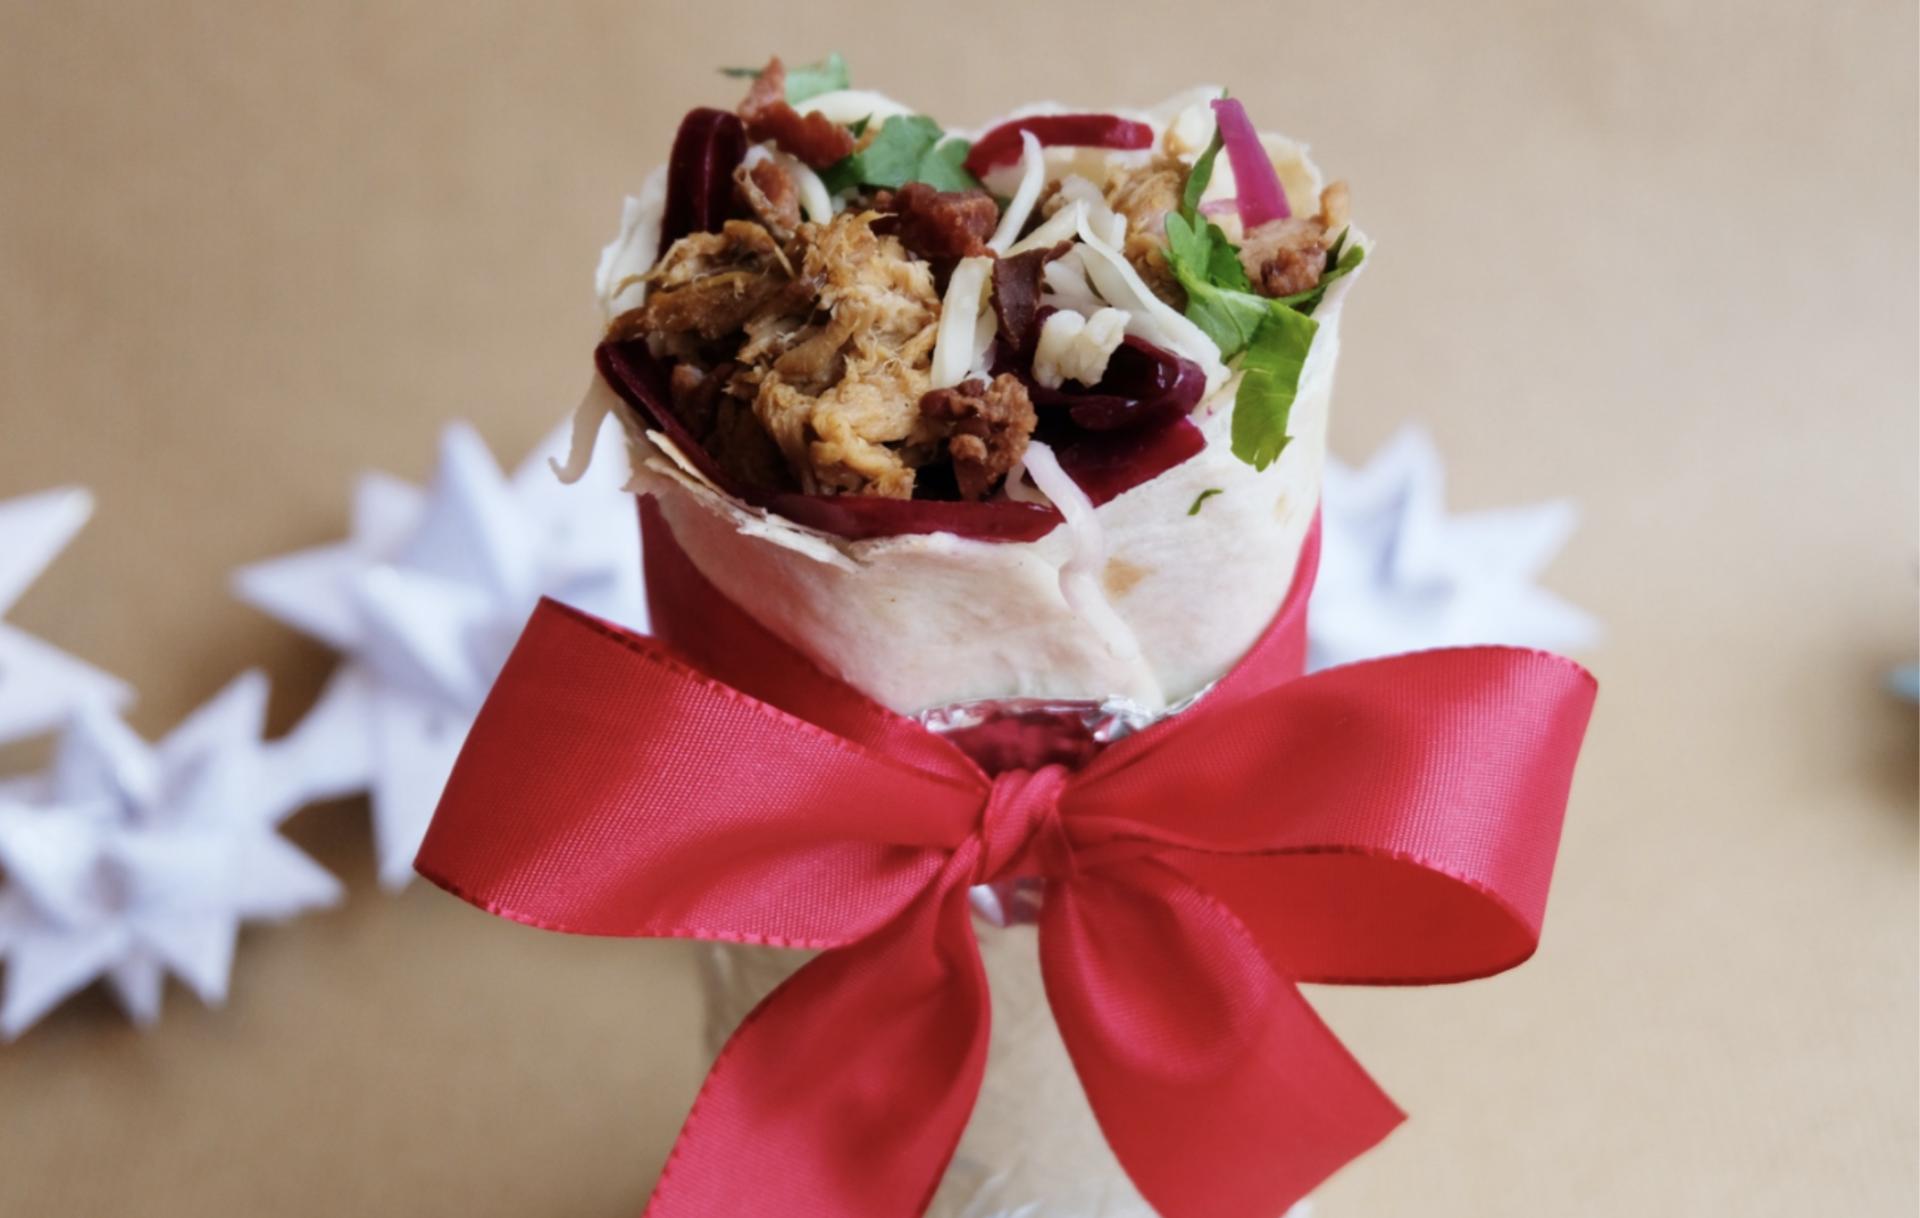 Juleburritoen er tilbage på menuen hos Chido Mexican Grill